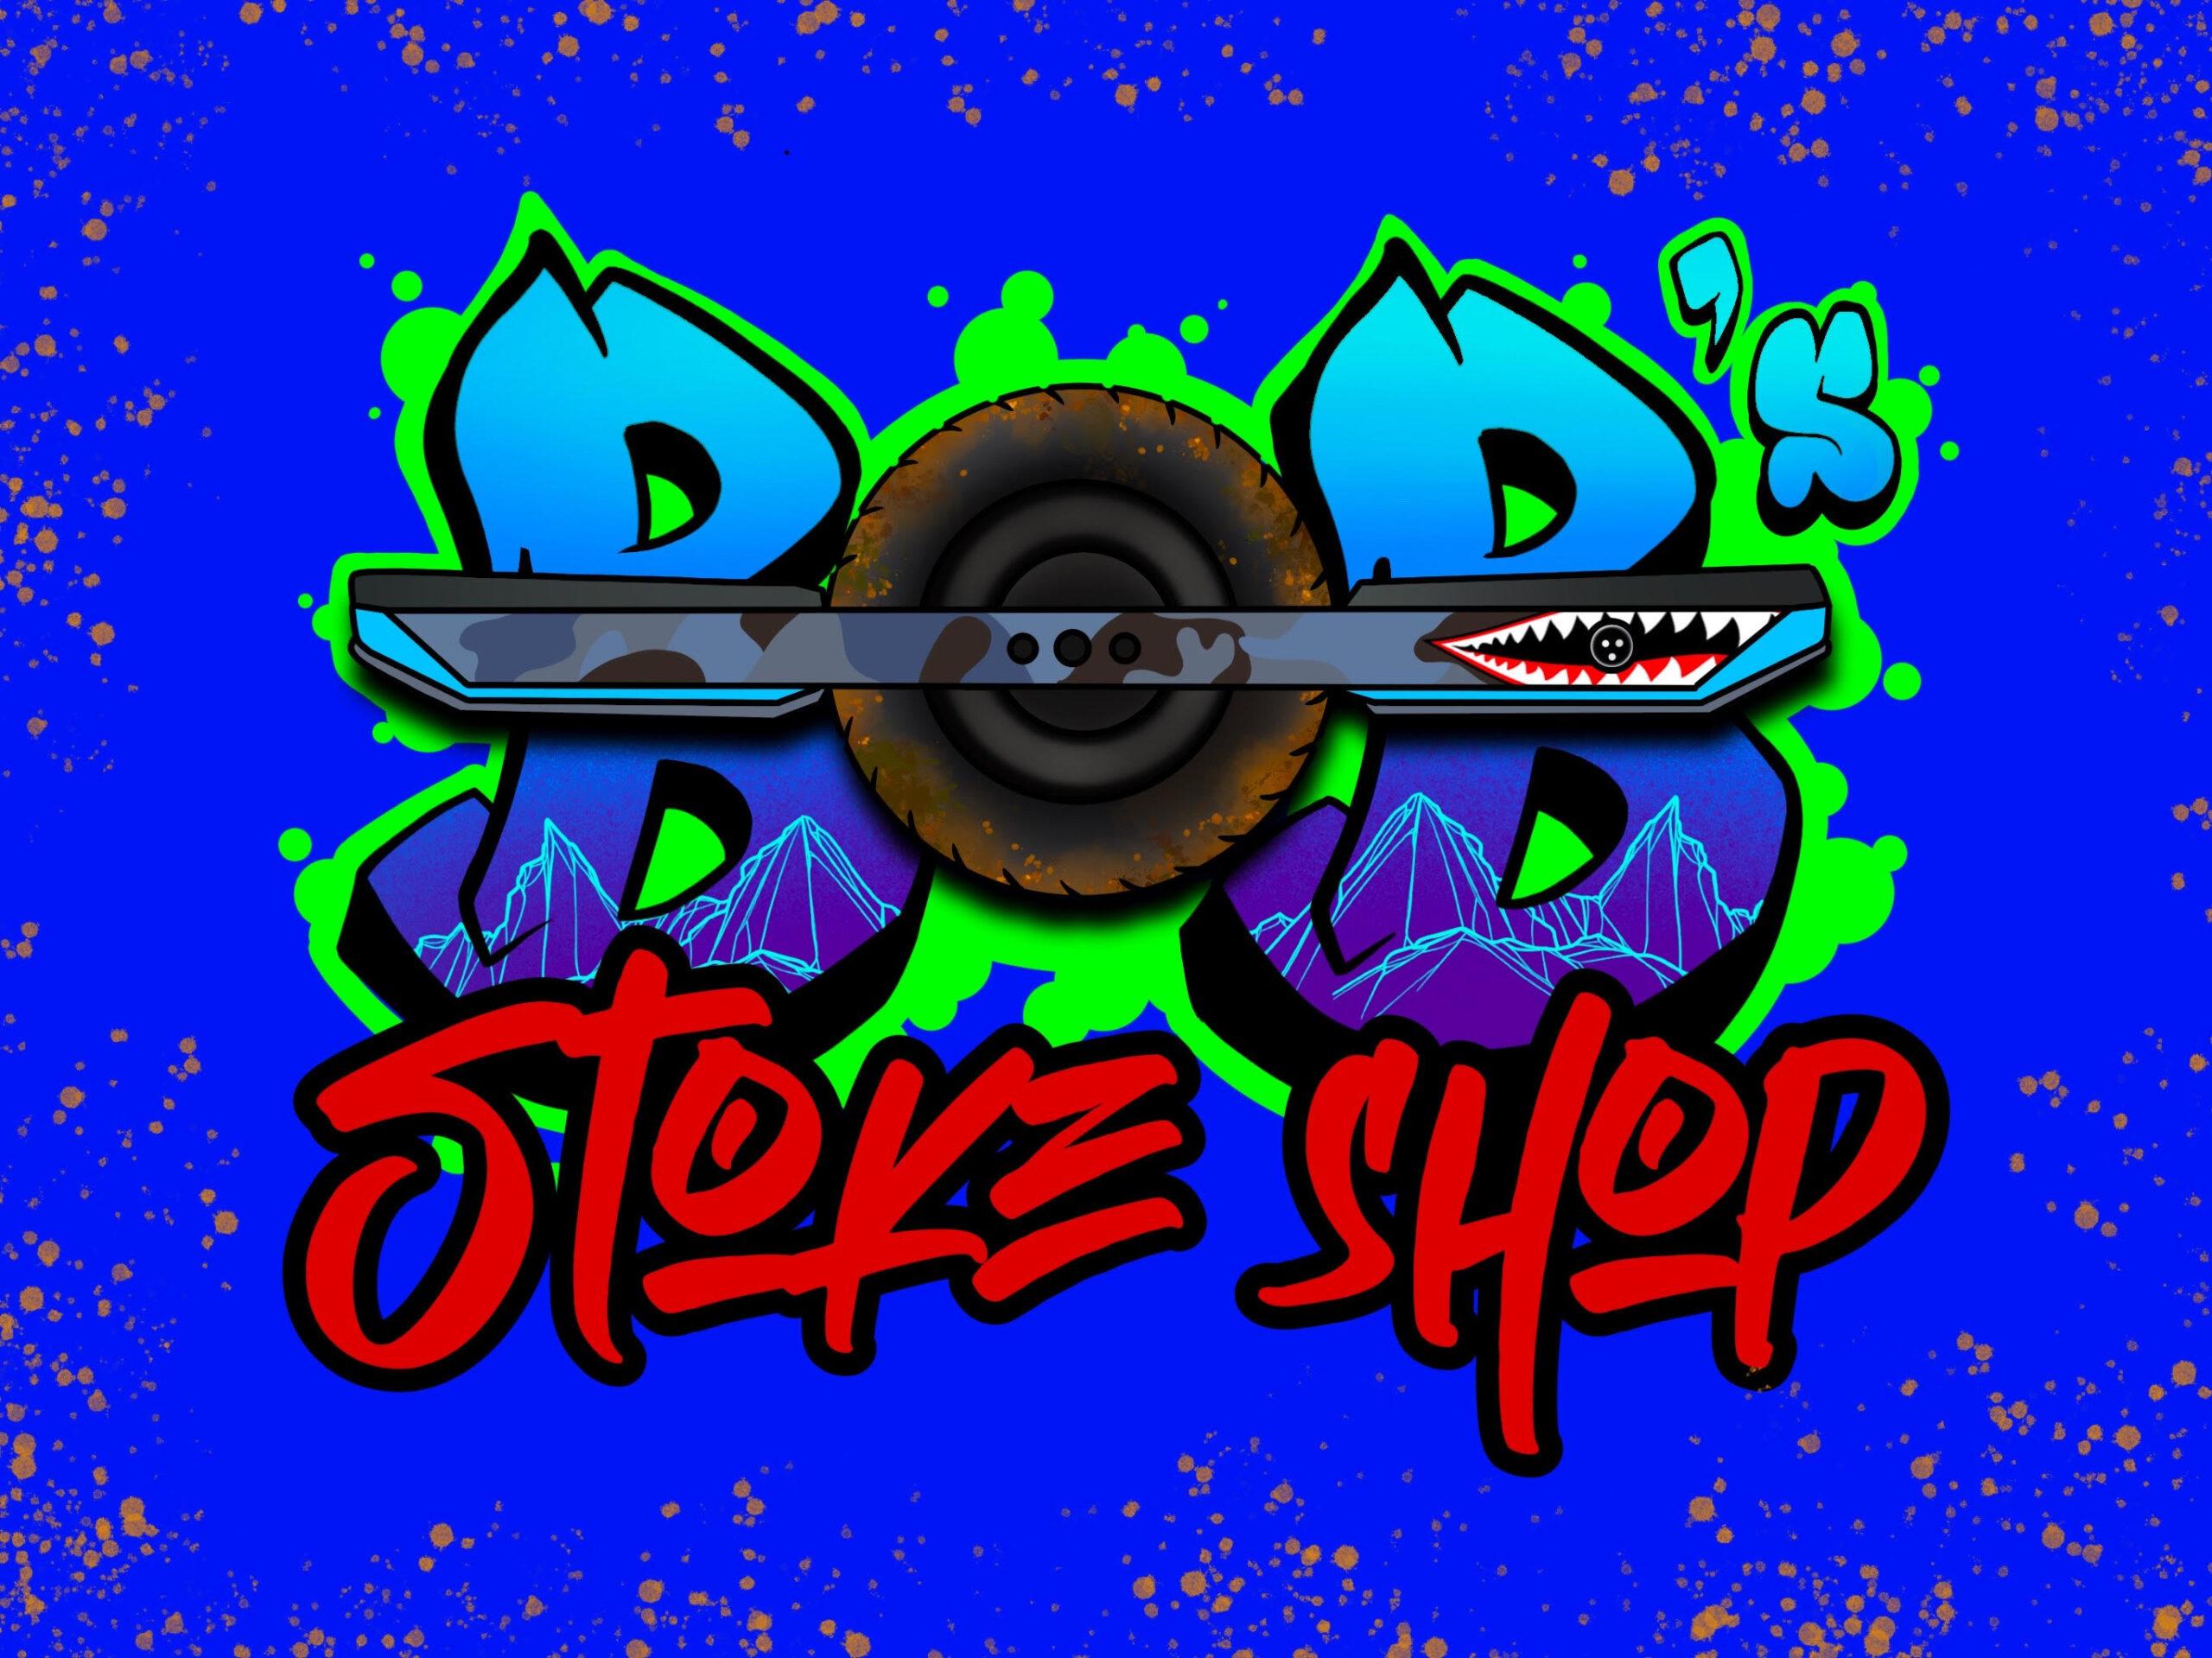 bobs stoke shop